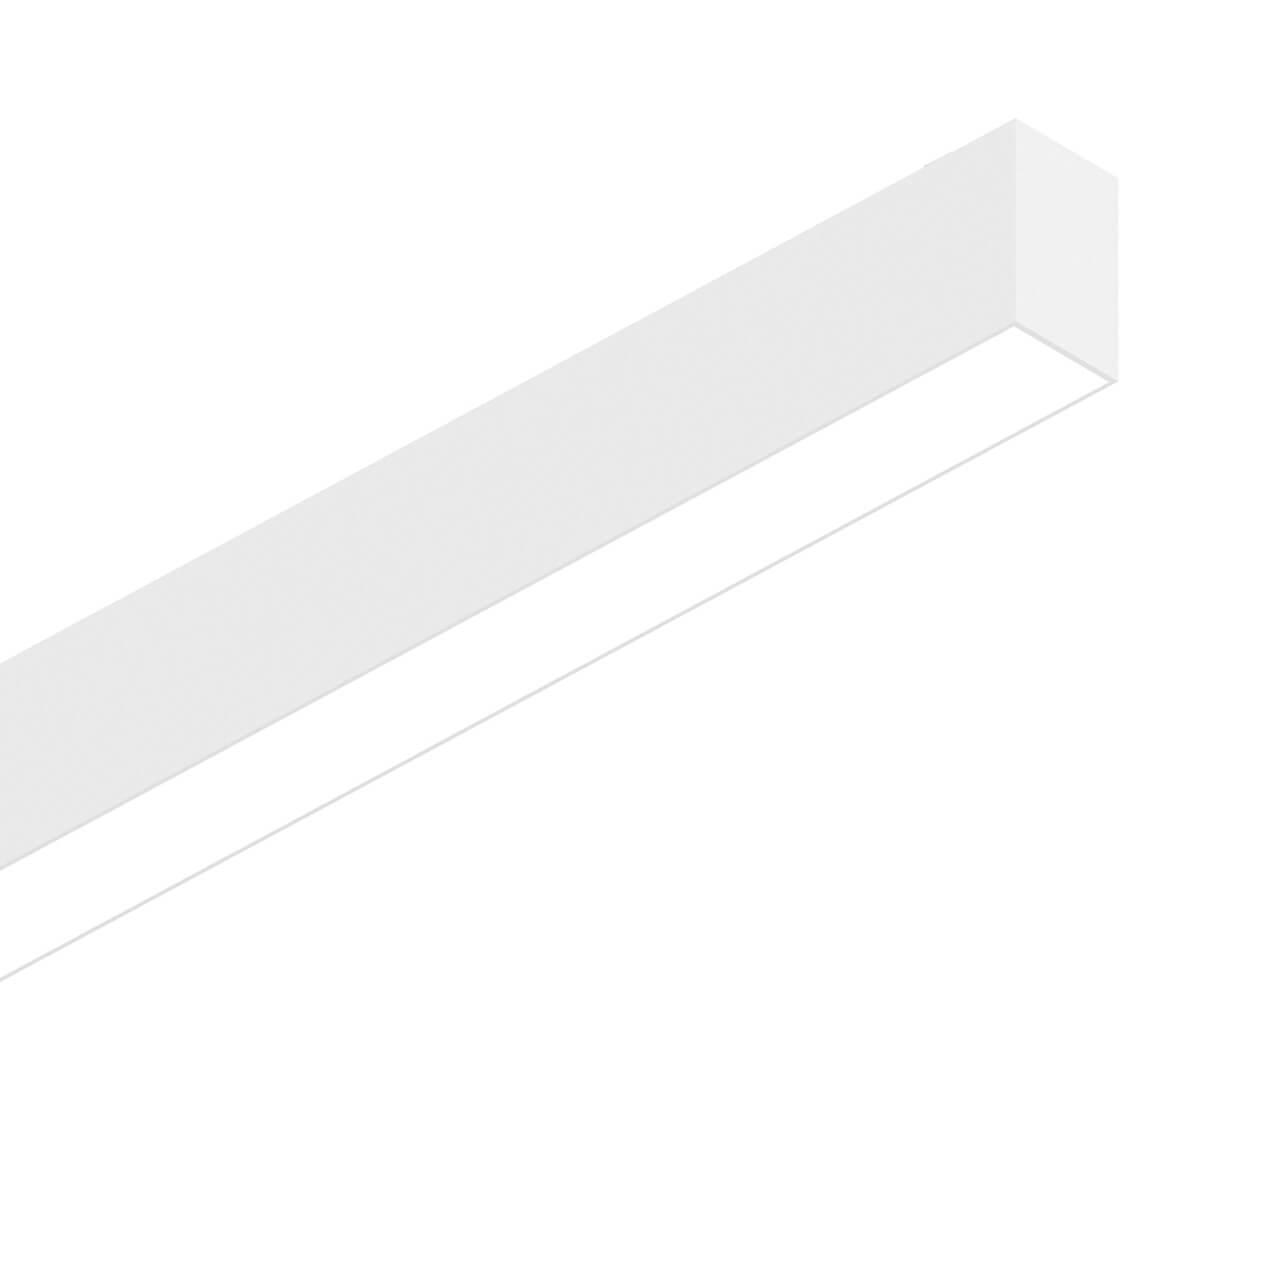 Подвесной светодиодный светильник Ideal Lux Fluo Wide 1800 3000K White diy 3w 3000k 315lm warm white light round cob led module 9 11v